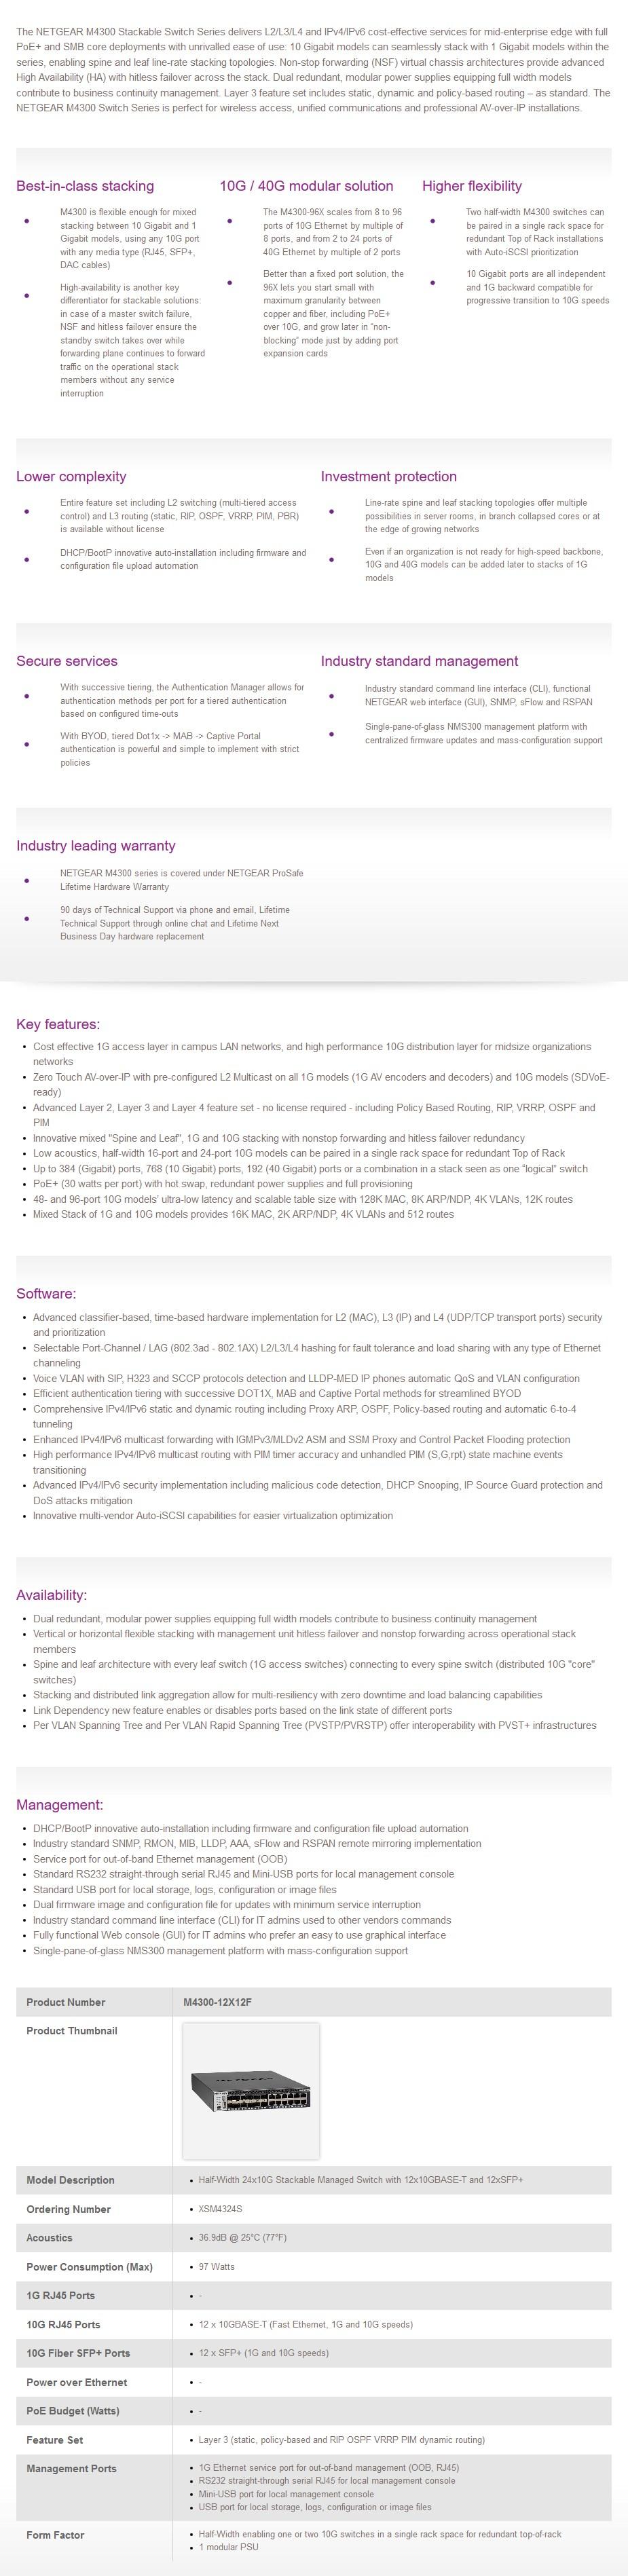 Netgear ProSAFE M4300-12X12F 24-Port Managed Switch - Overview 2